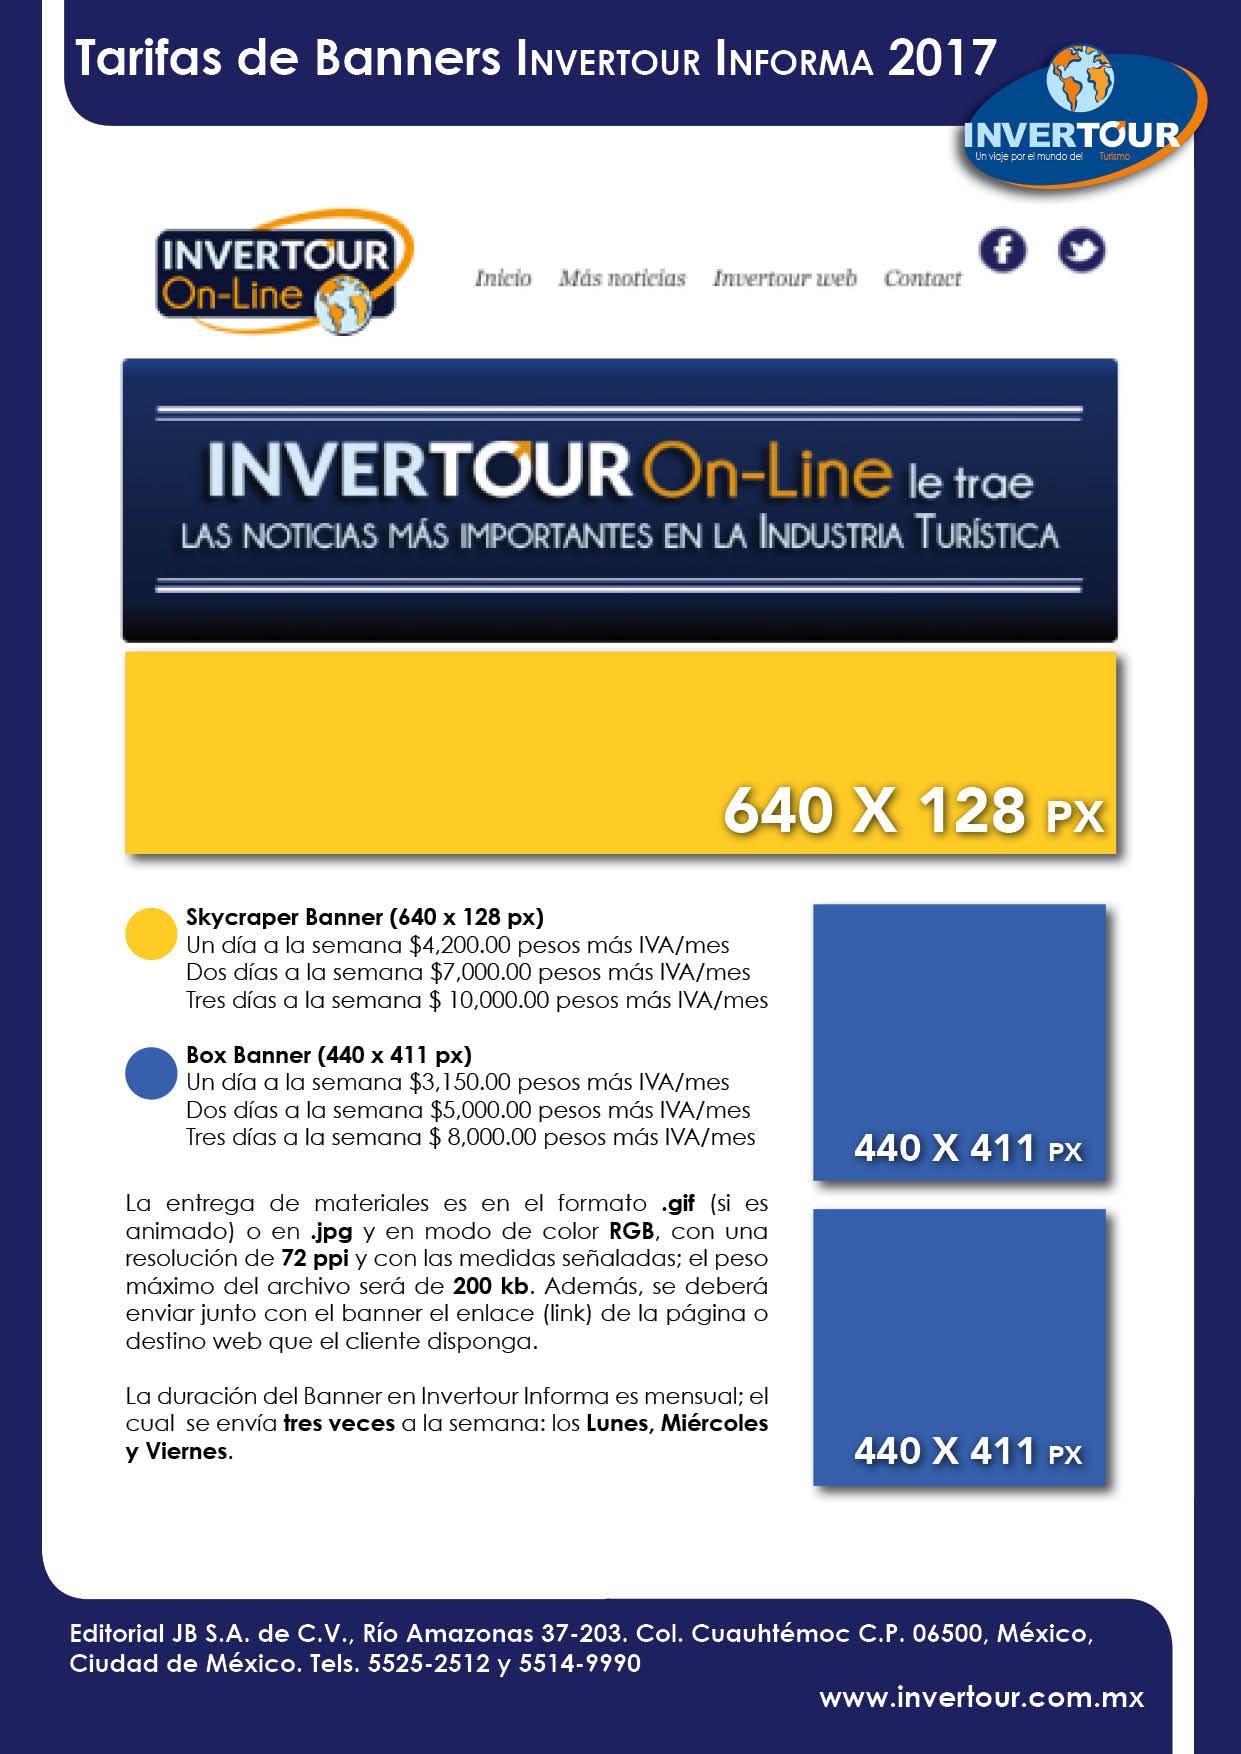 tarifas-invertourinforma-2017-esppesook